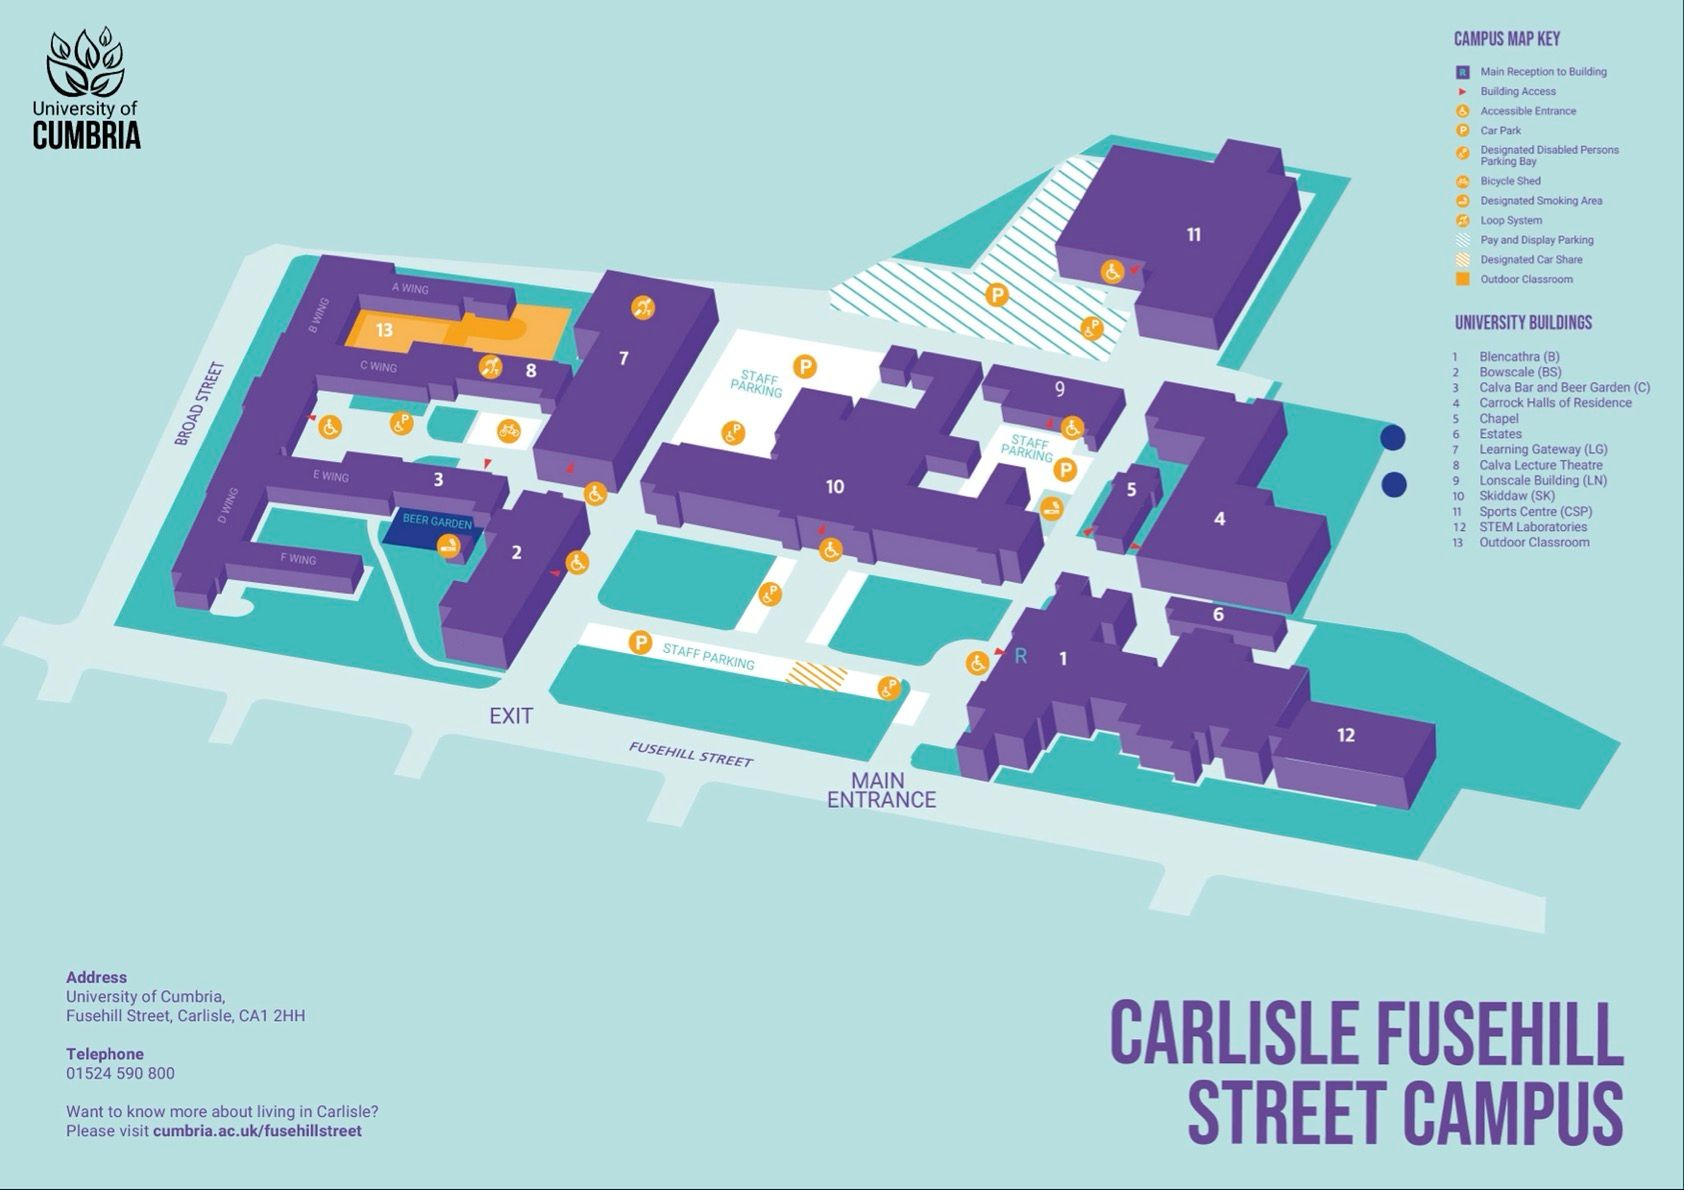 university of cumbria carlisle fusehill street